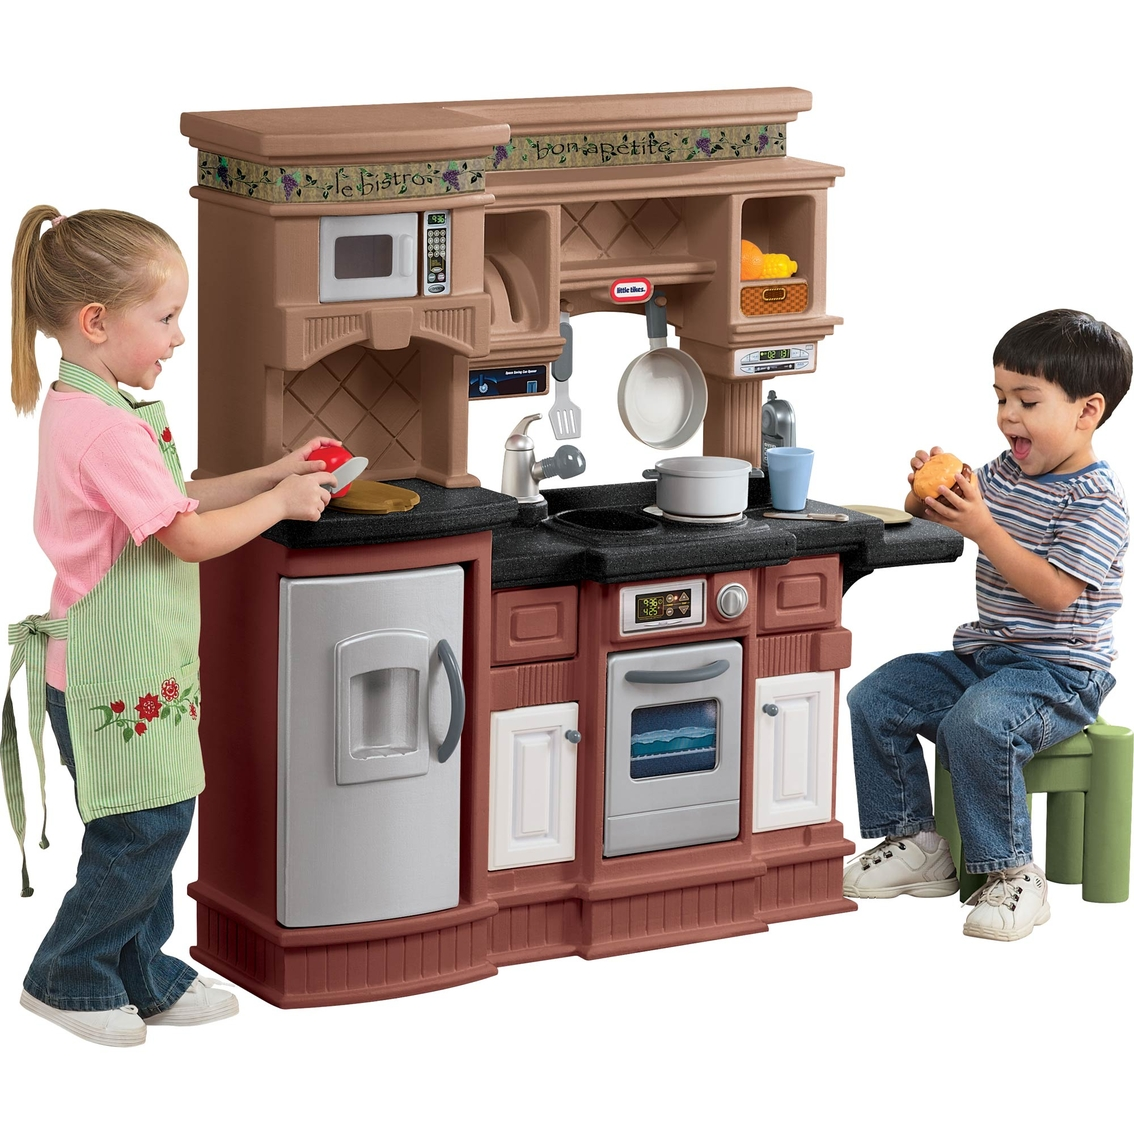 Little Tyke Kitchen Set: Little Tikes Gourmet Prep 'n Serve Kitchen